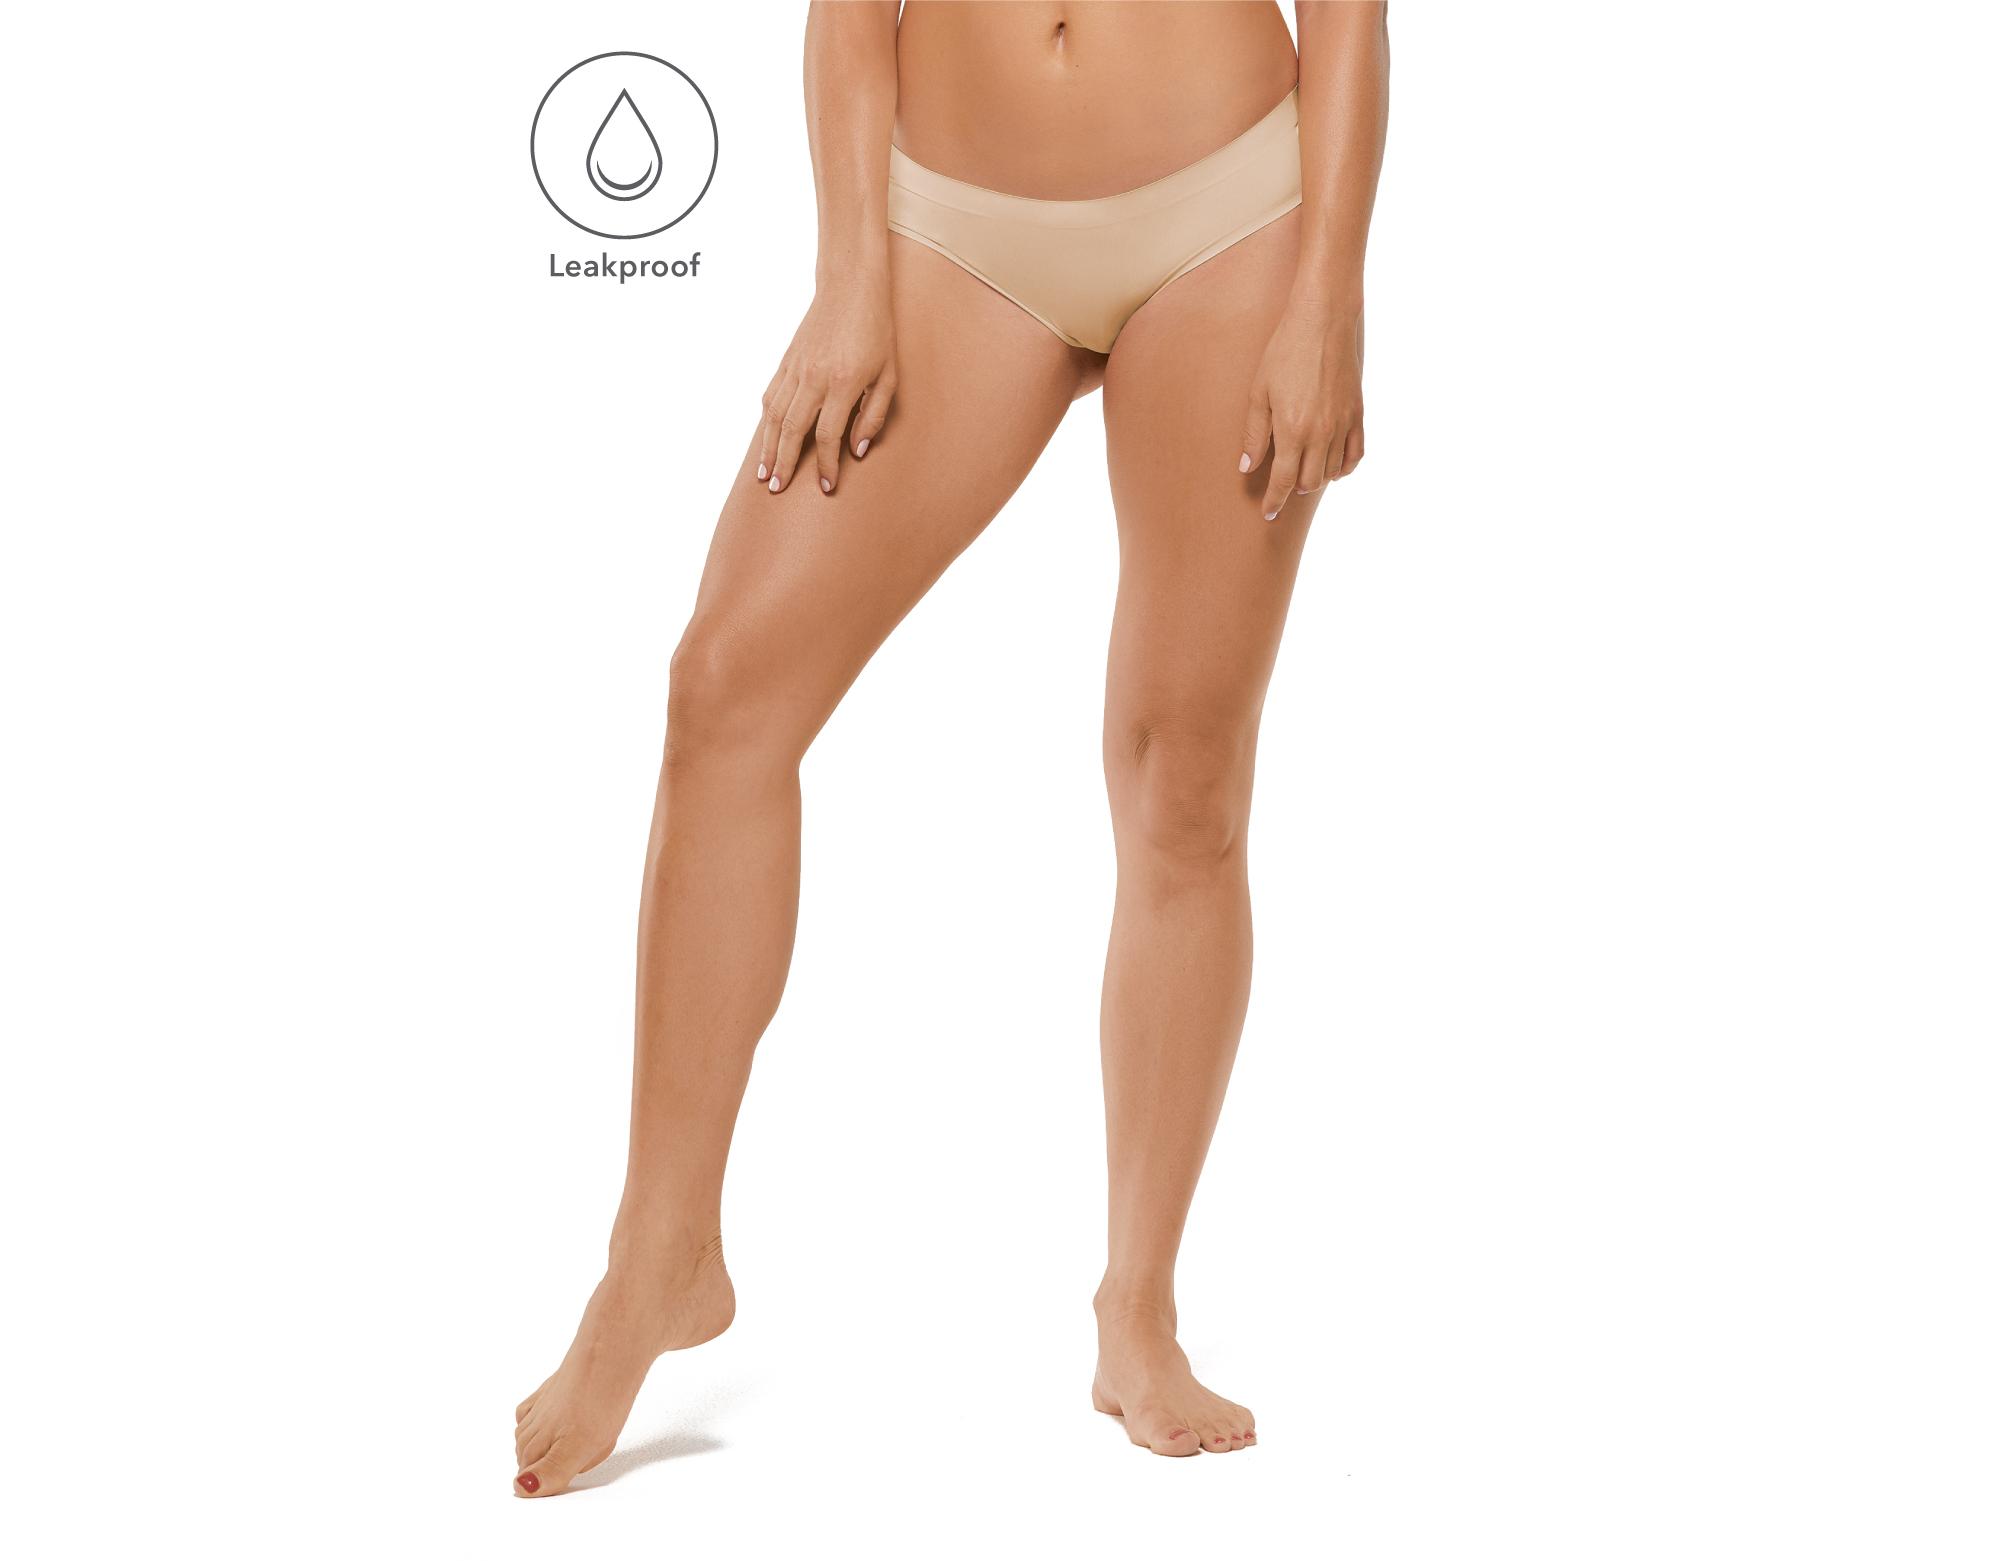 Knix Athletic Performance Leakproof Underwear